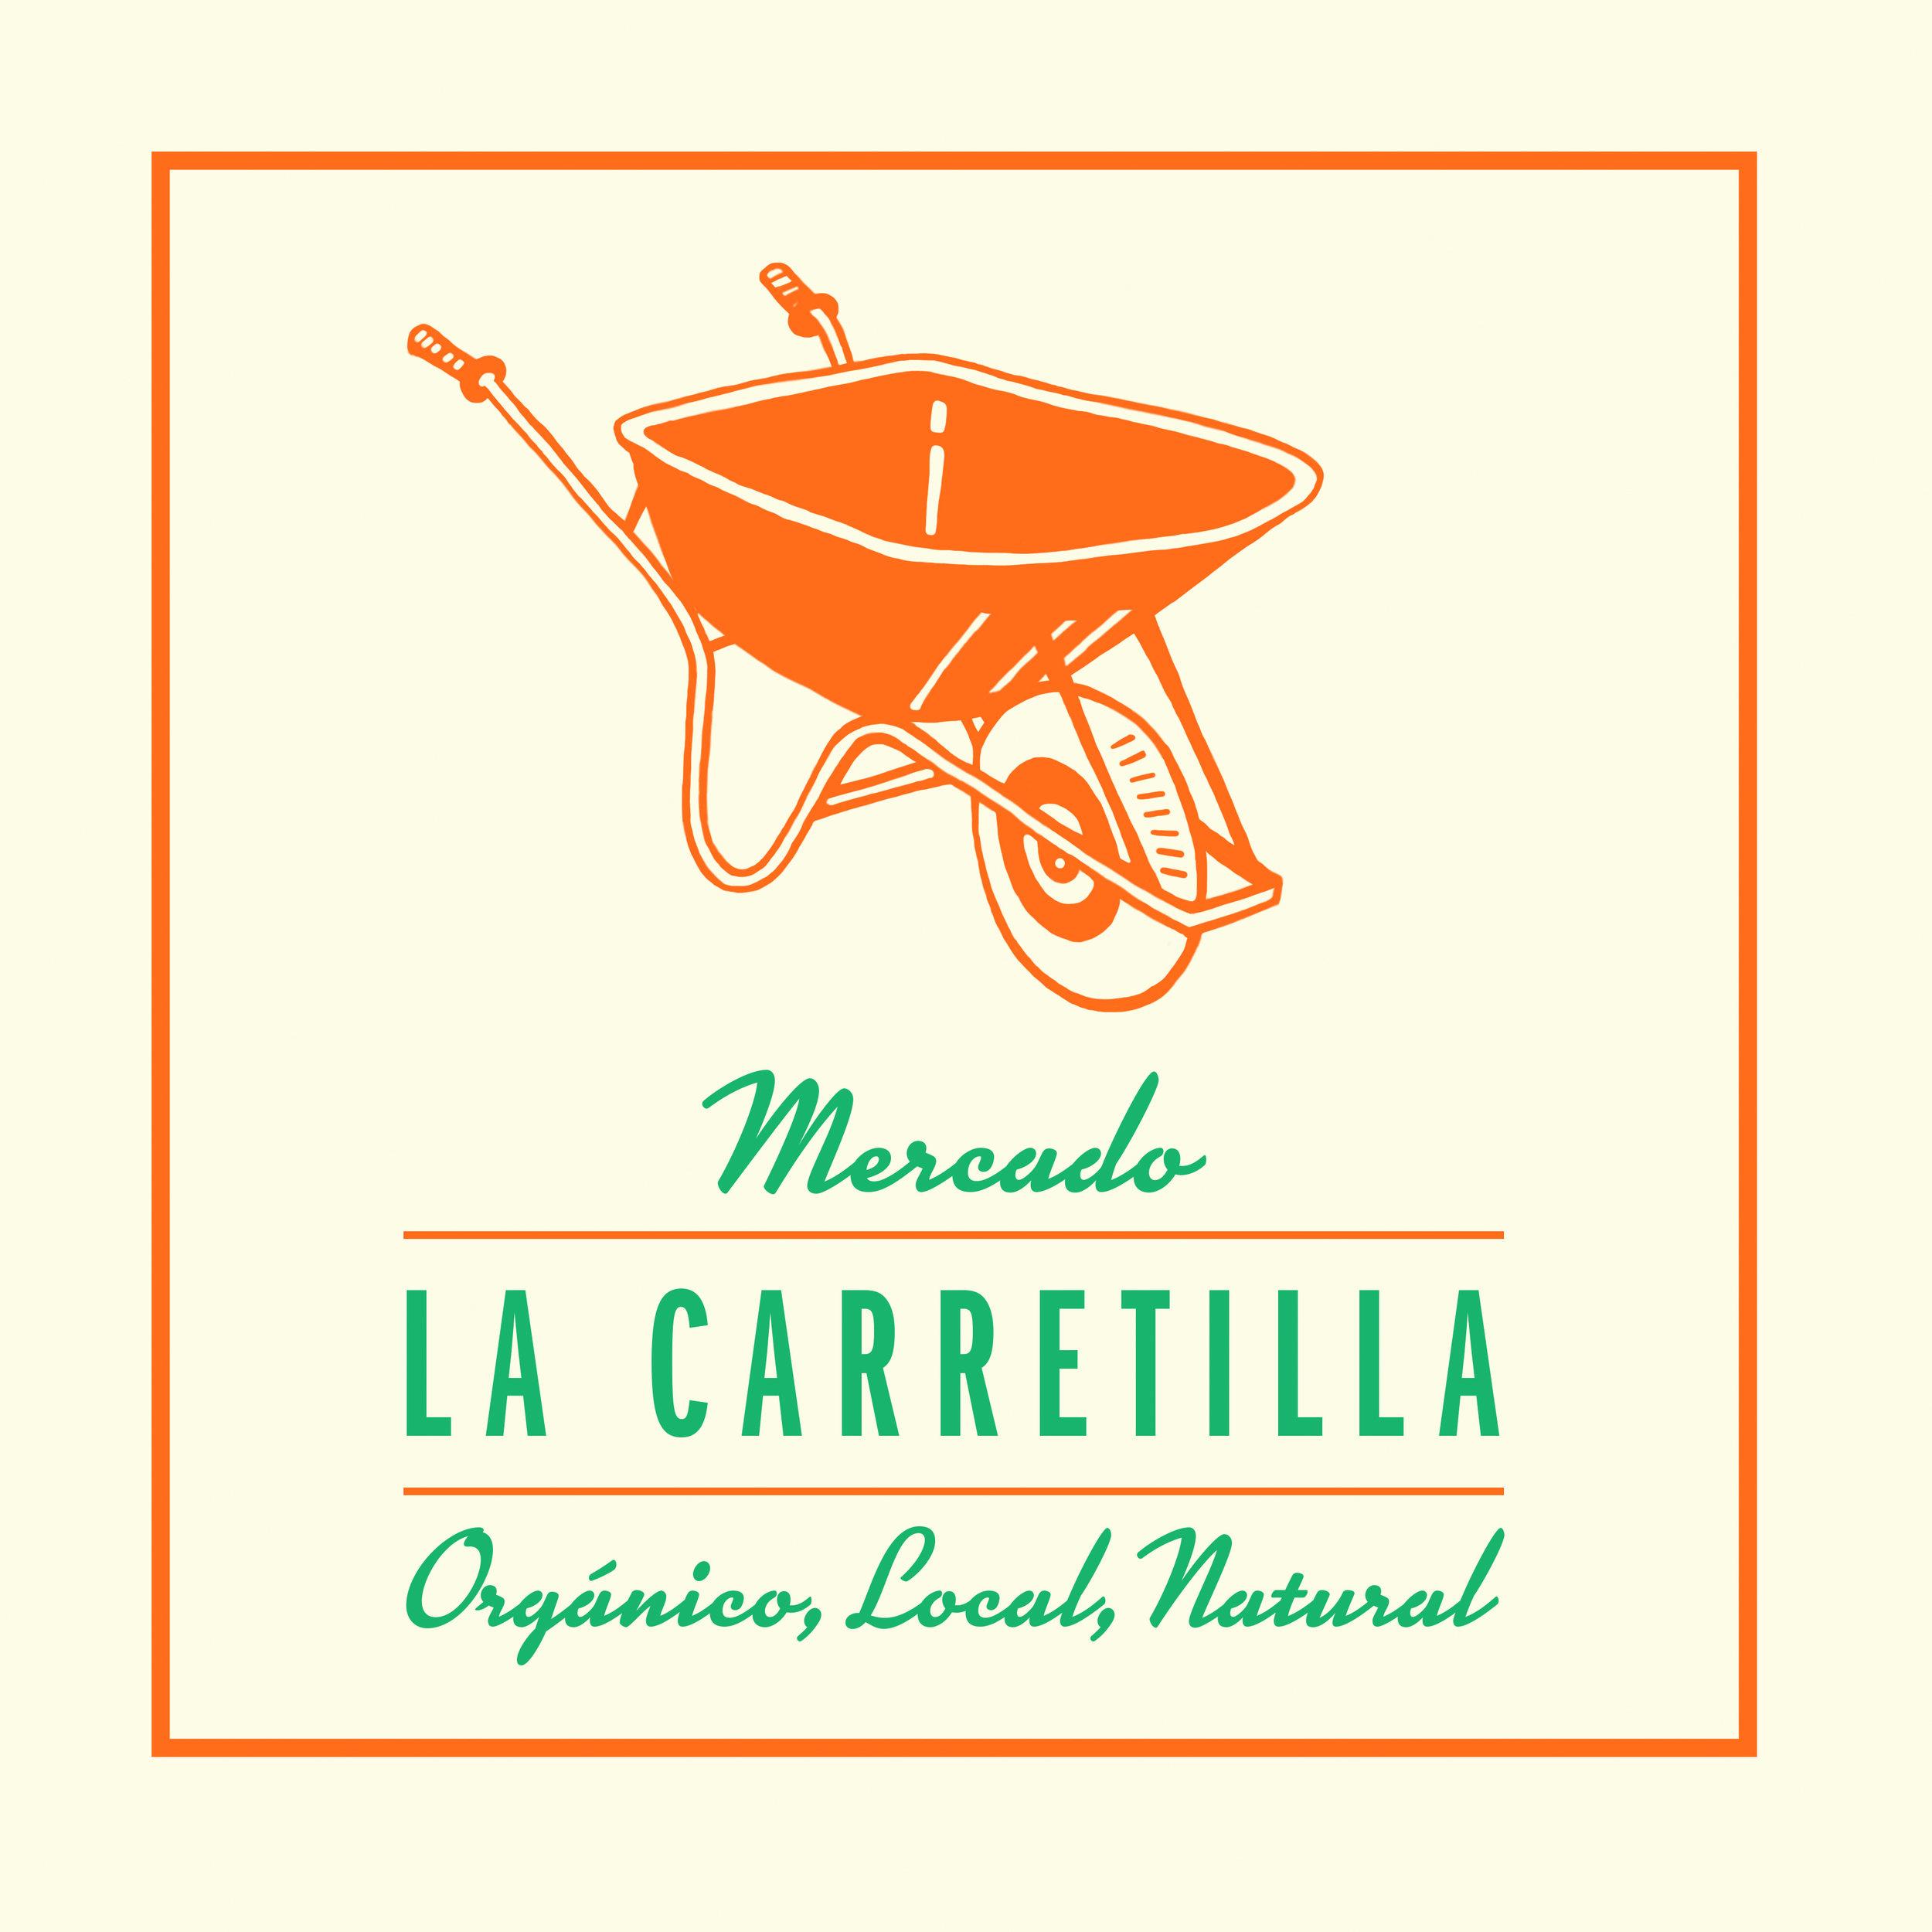 LACARRETILLA_LOGO.jpg